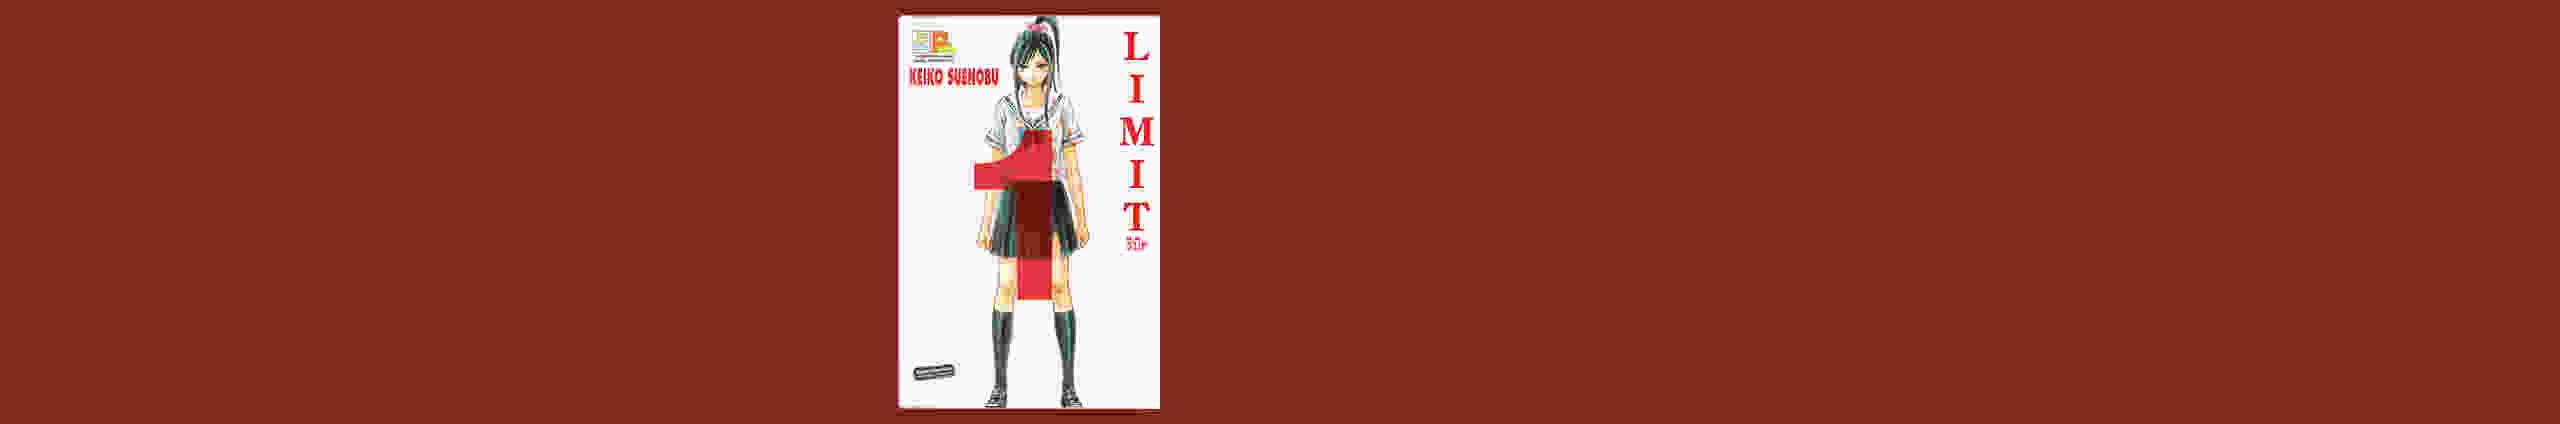 LIMIT ลิมิต